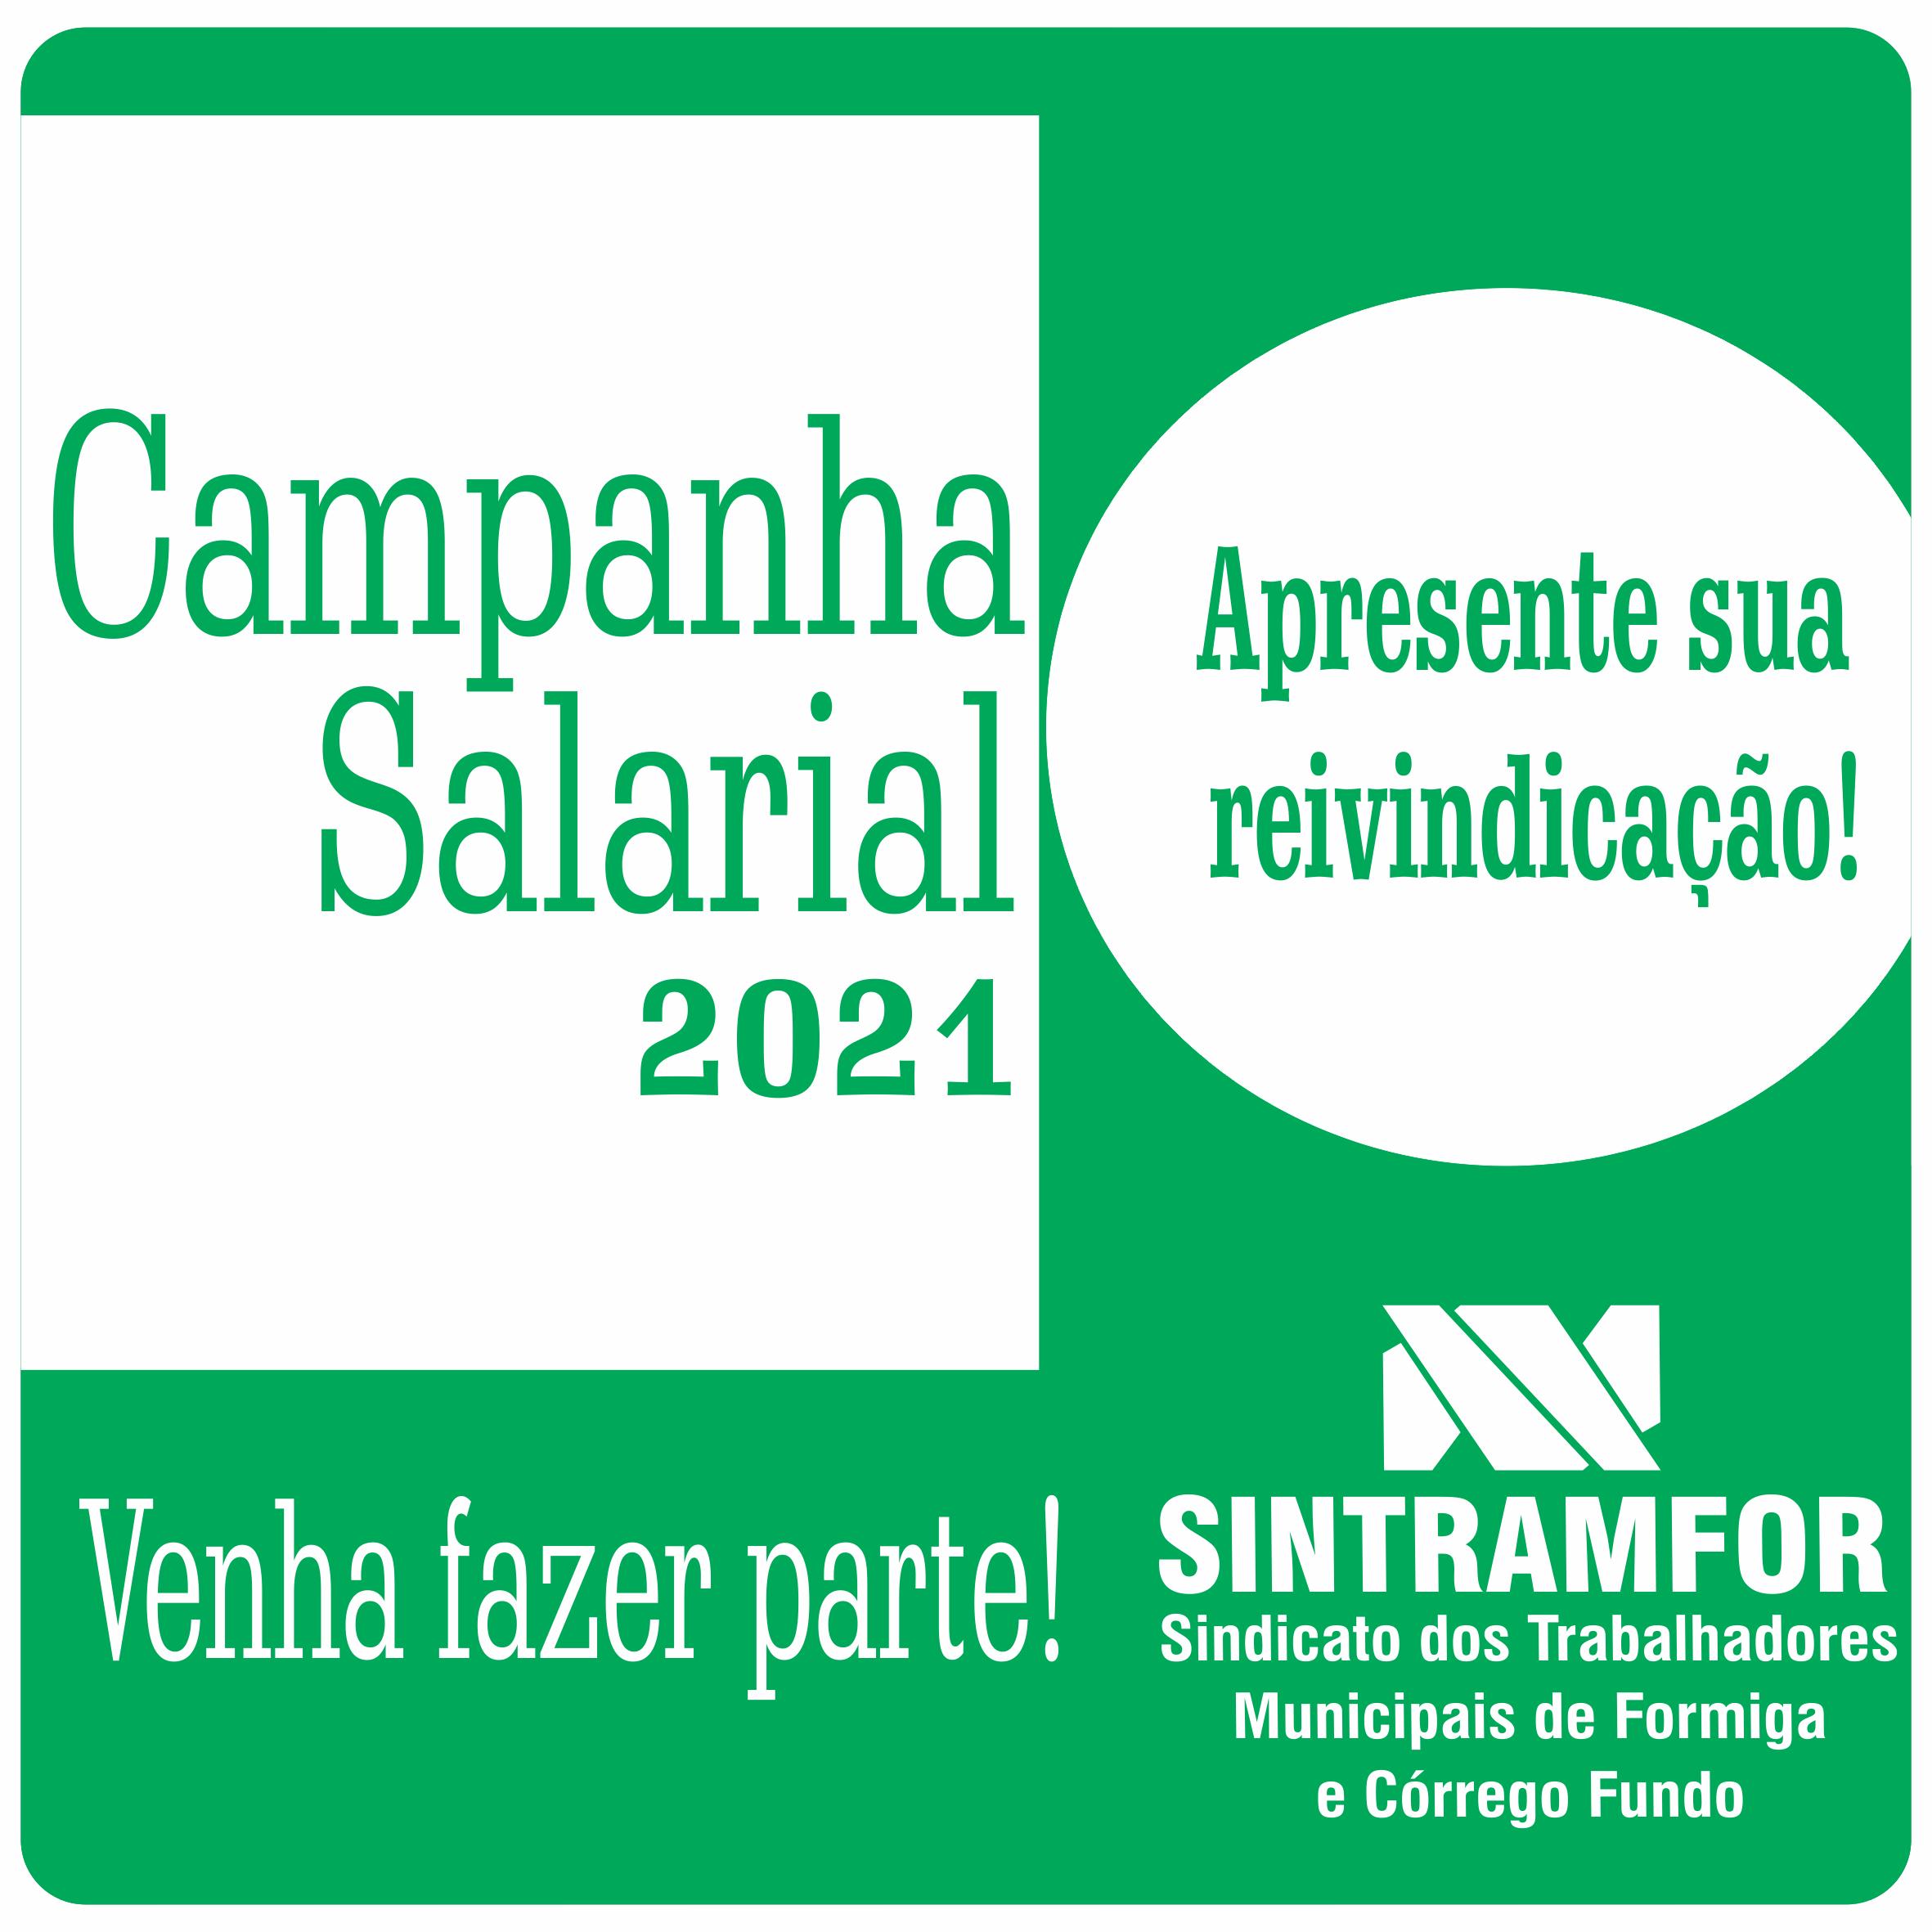 campanha_salarial_2021_insta_2